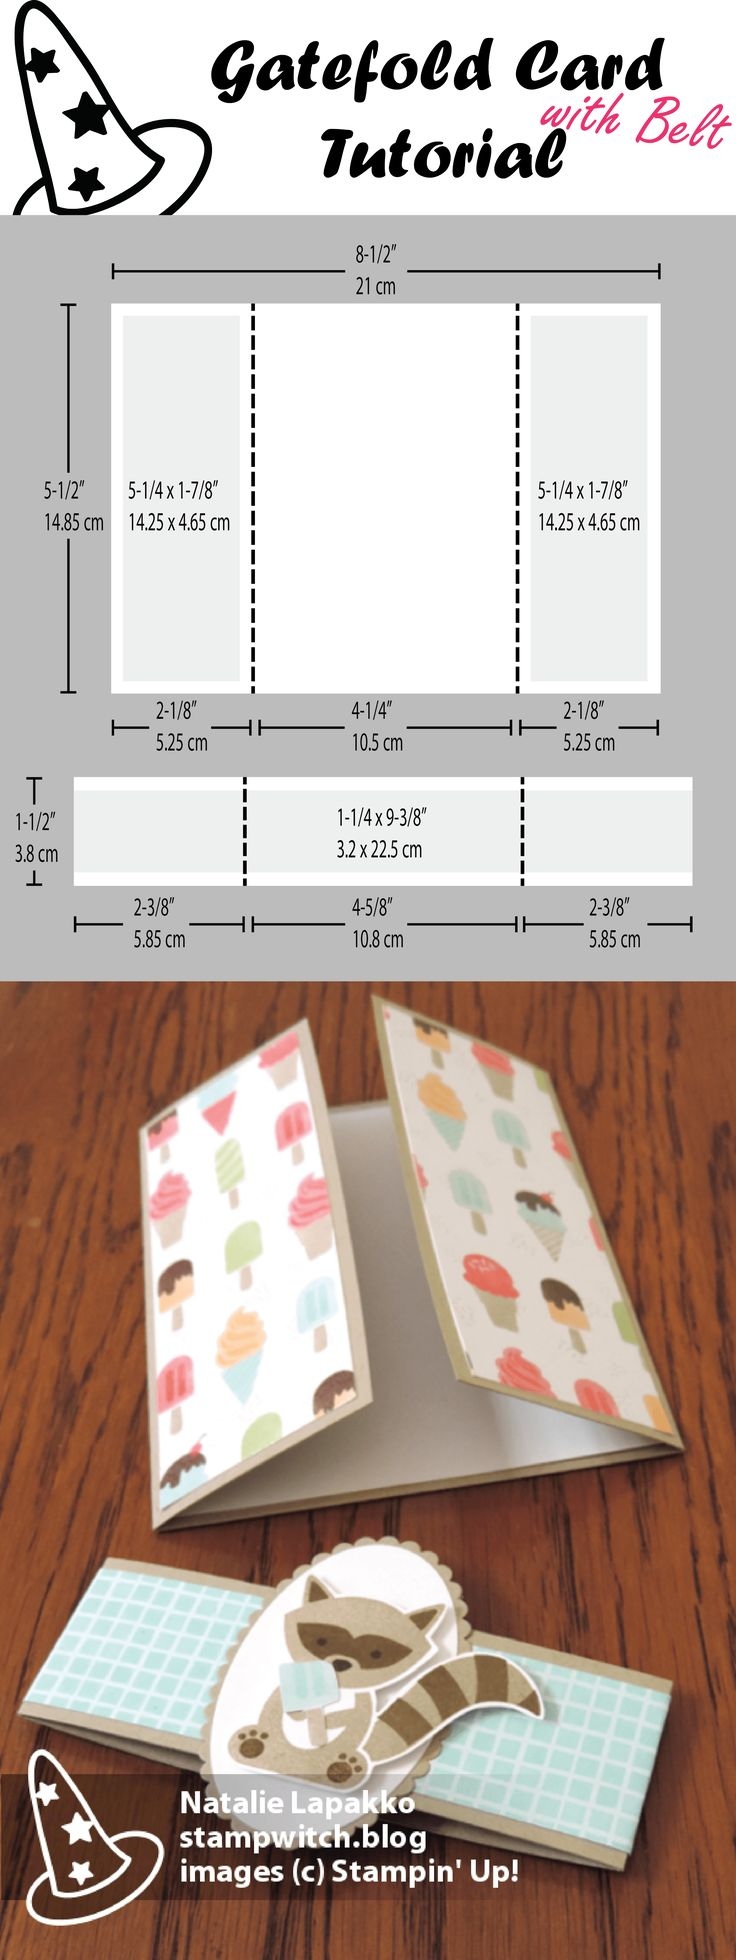 469 Best Fancy Folds Images On Pinterest Folded Cards Cardmaking